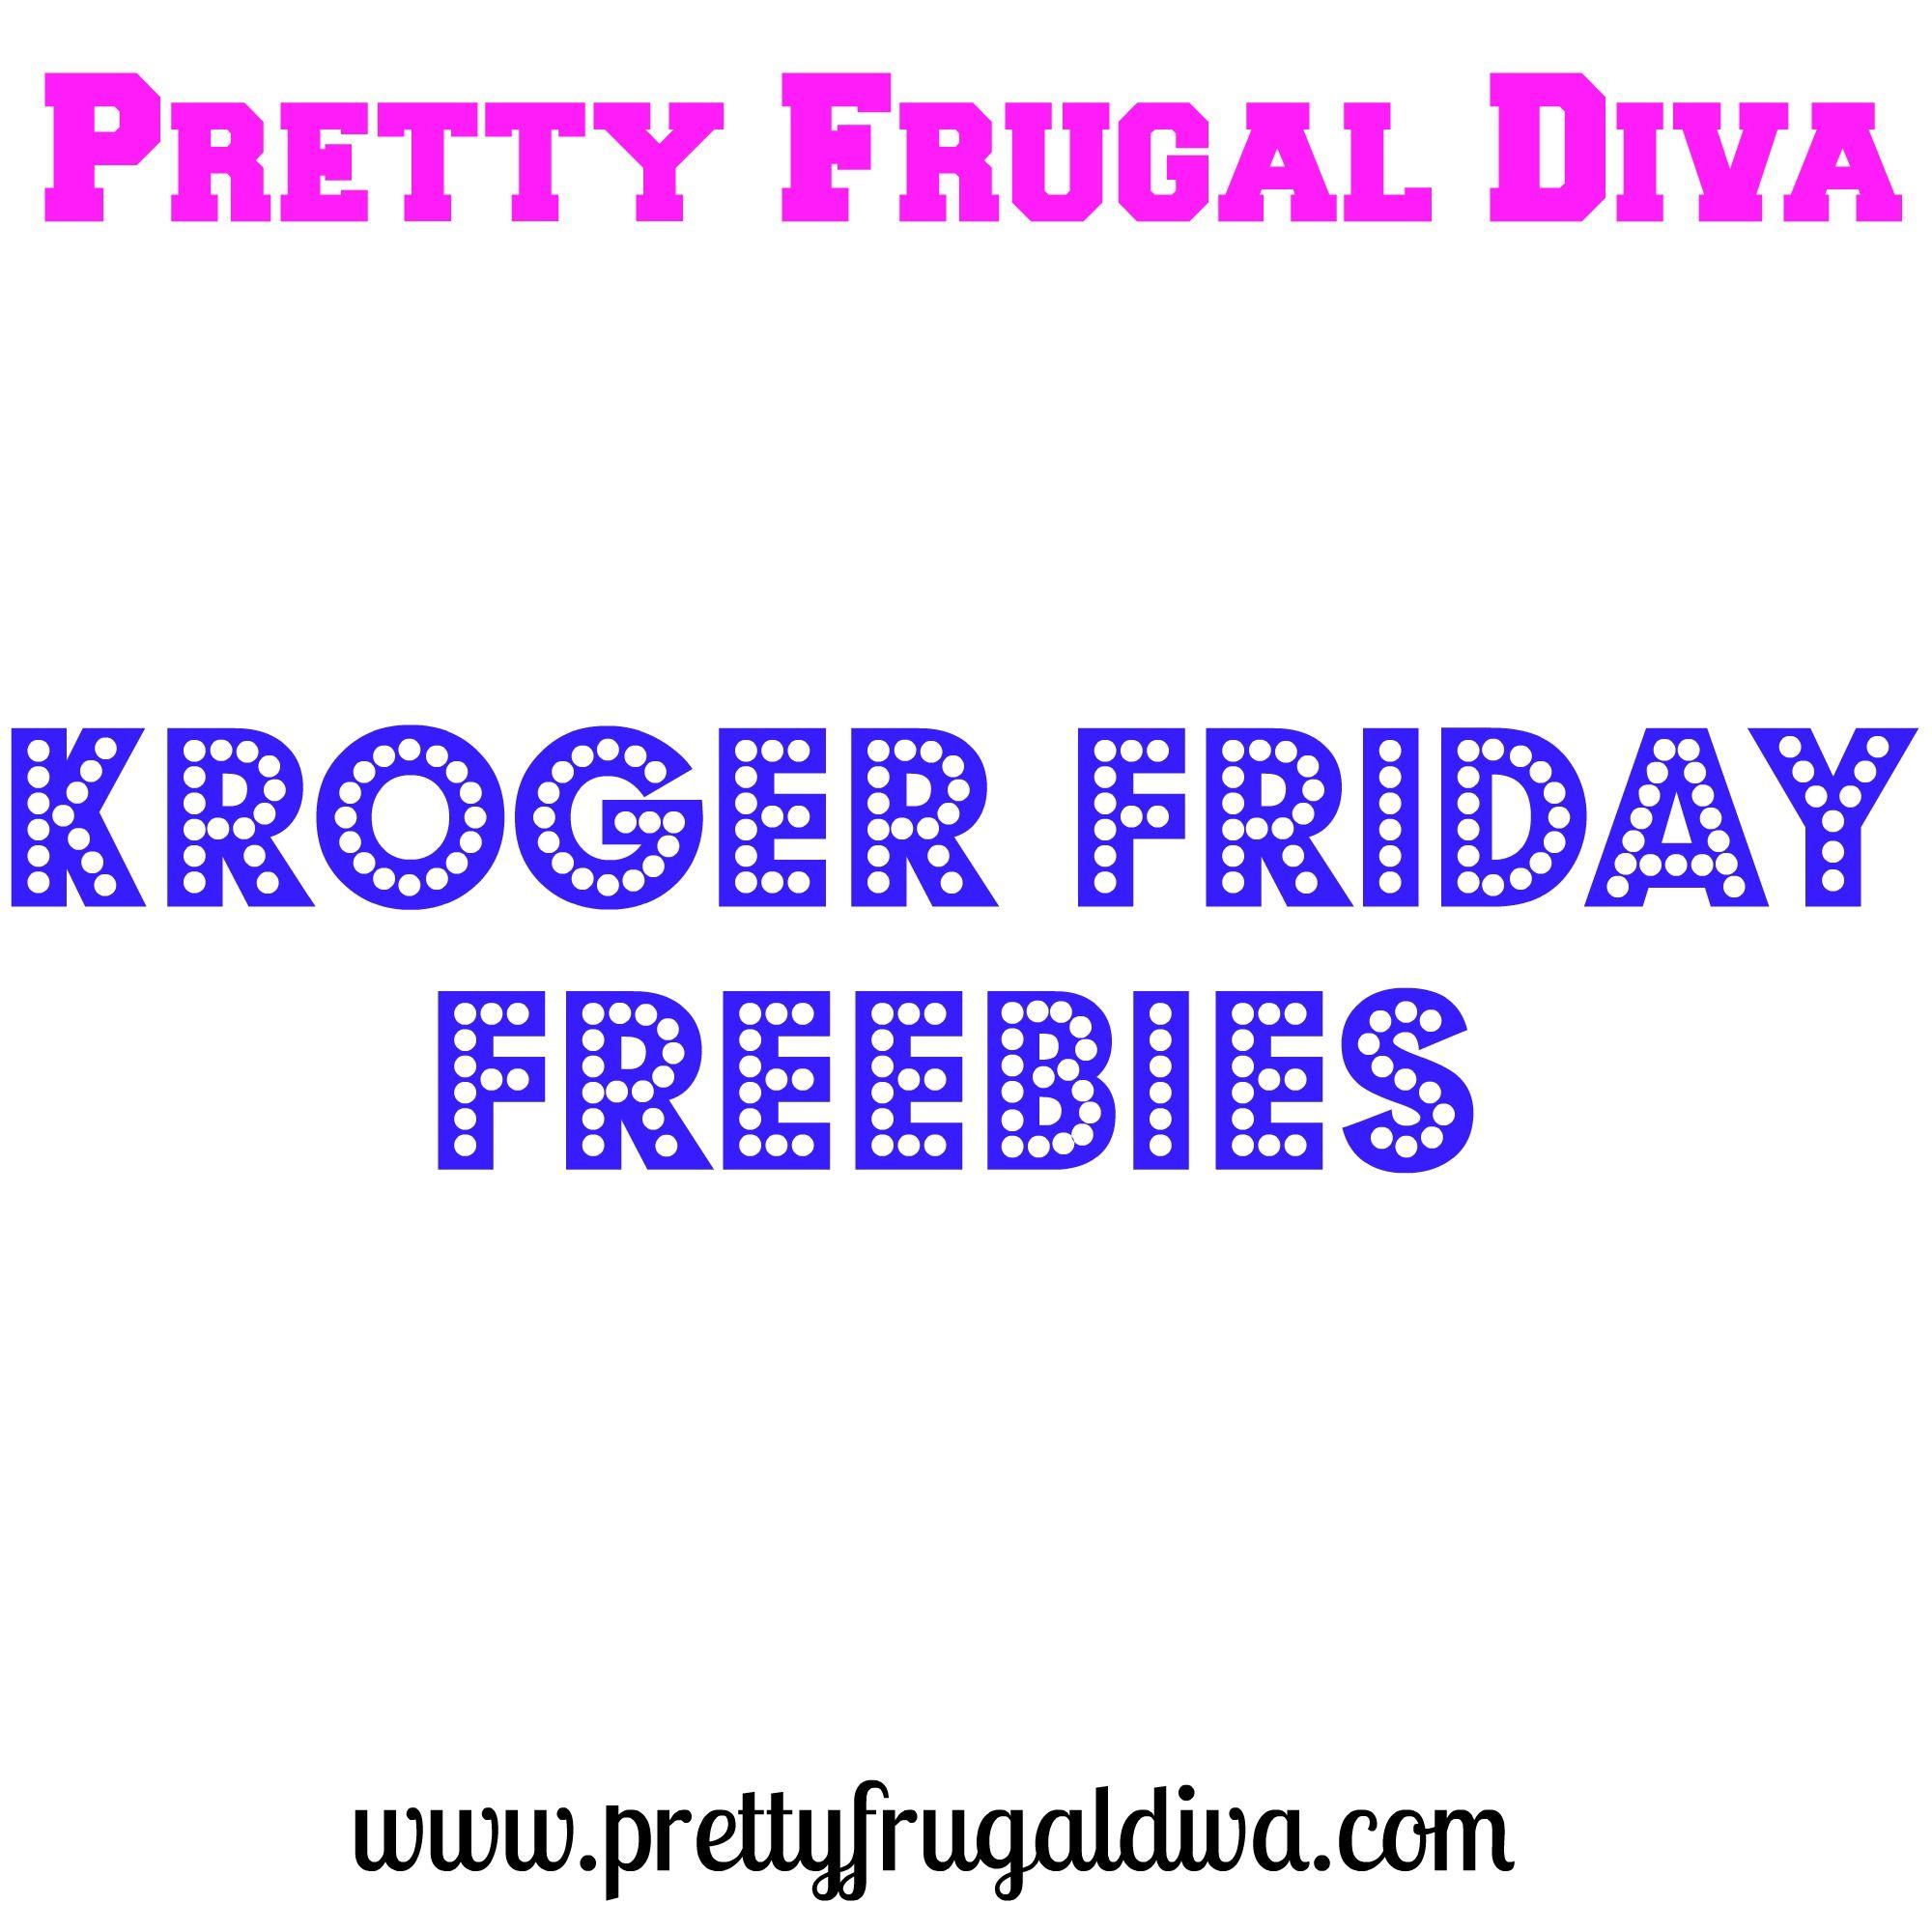 Kroger Friday Freebie 11 29 Pretty Frugal Diva Kroger Kroger Couponing Coupons For Free Items